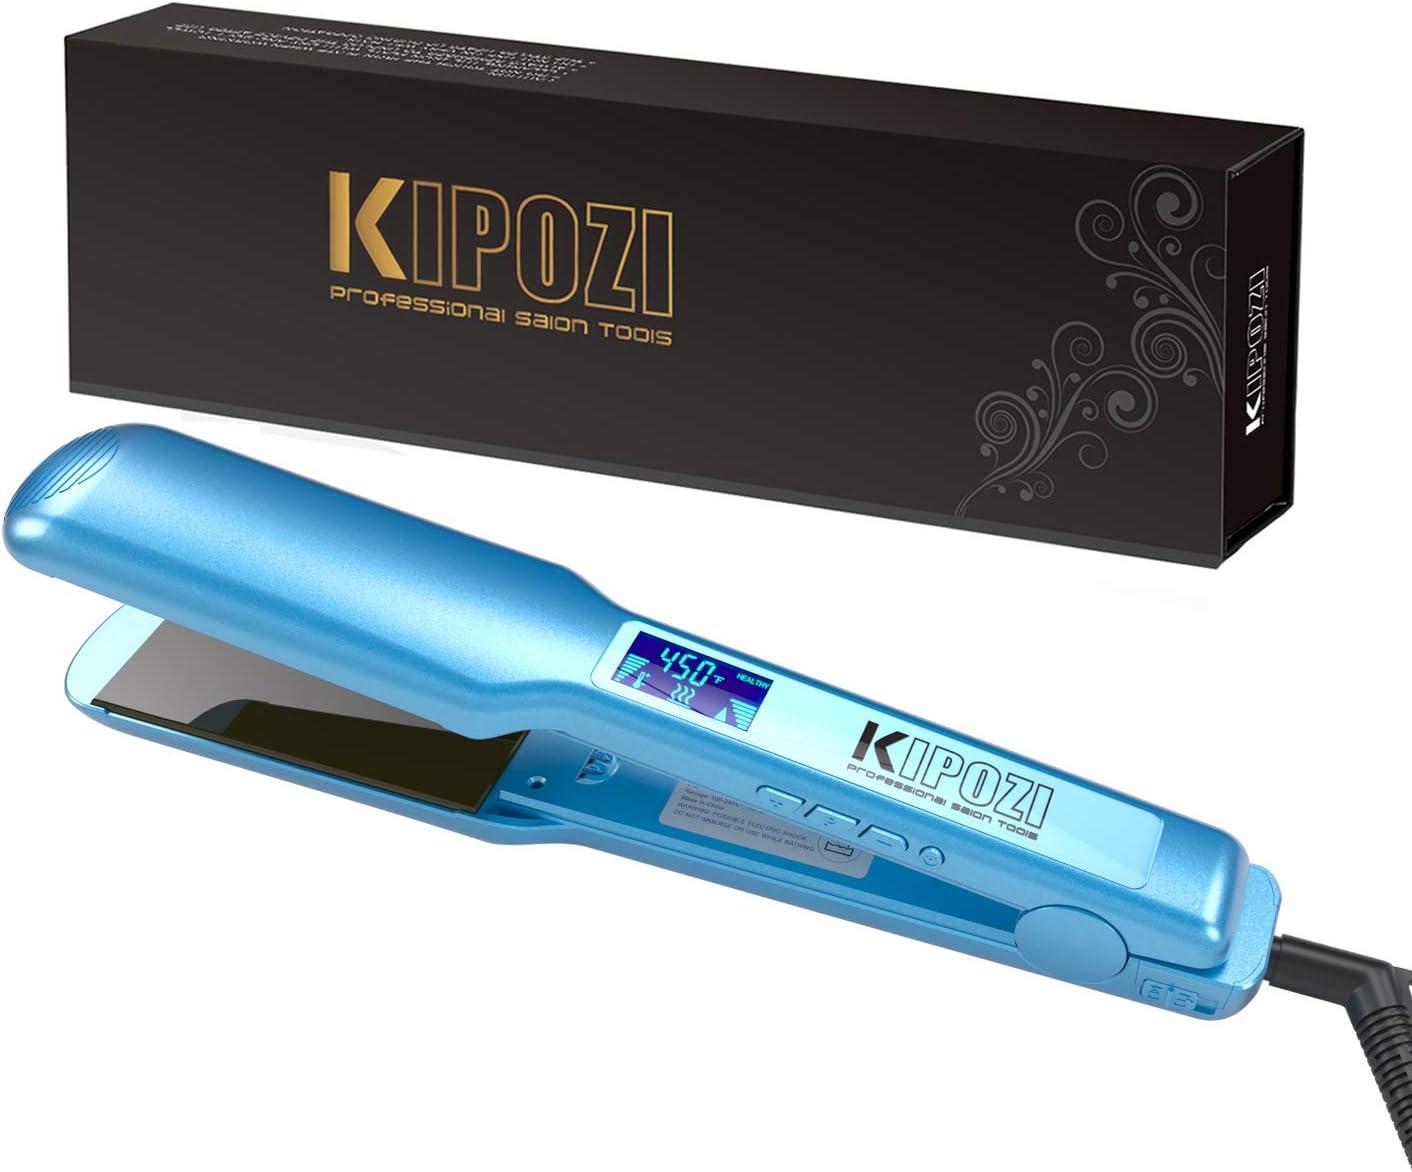 KIPOZI Pro Nano Titanium Hair Straightener Flat Iron with